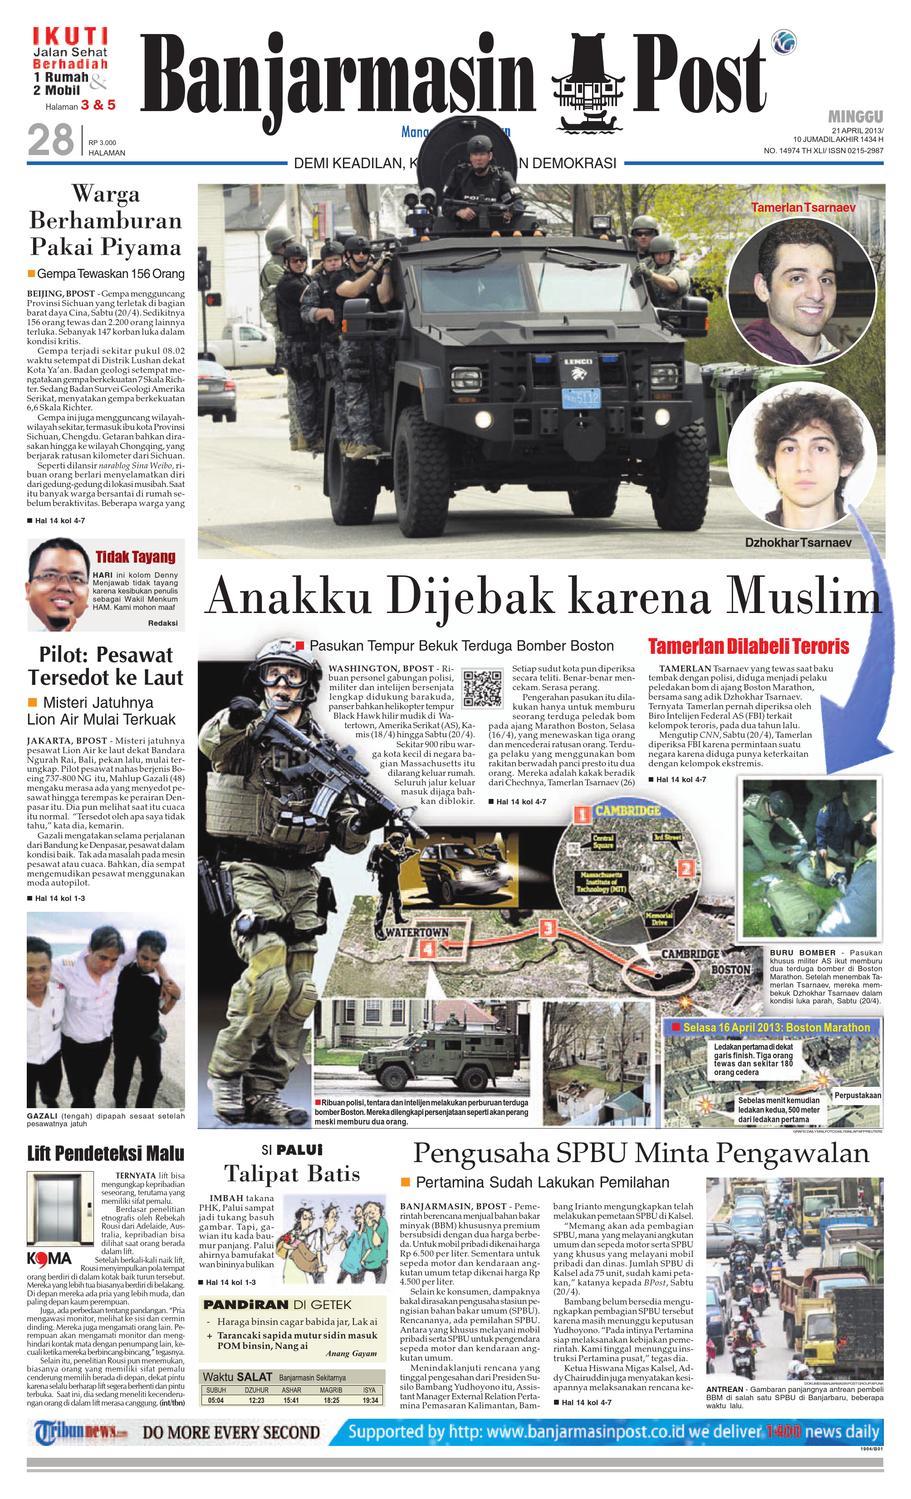 Banjarmasin Post Edisi Minggu 21 April 2013 By Issuu Produk Ukm Bumn Barbekyu Kelitik Surabaya